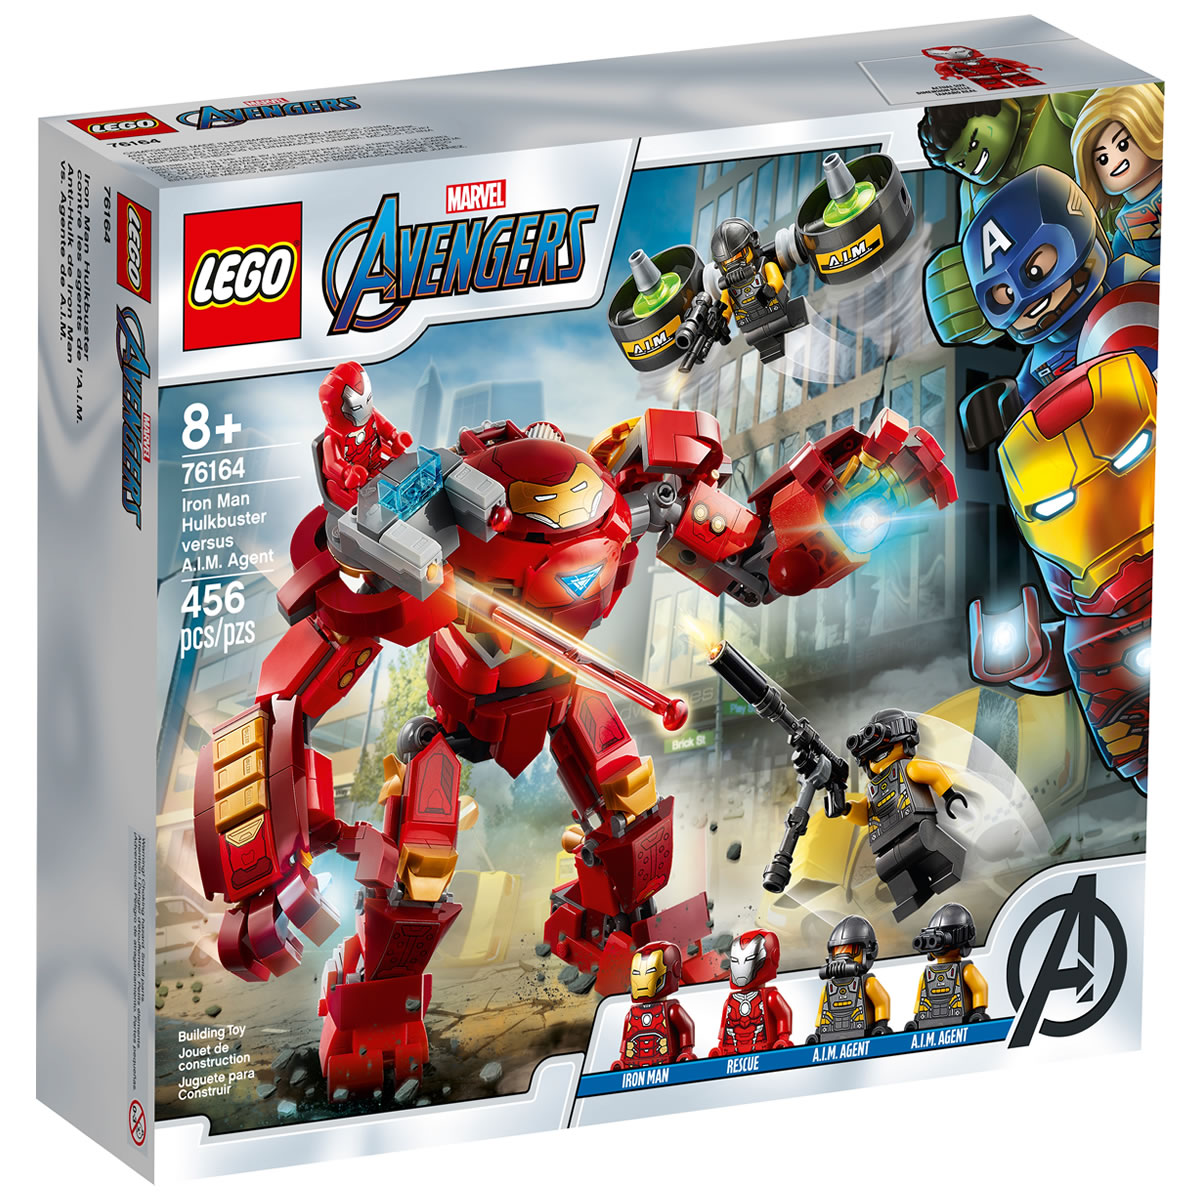 76164-lego-marvel-iron-man-hulkbuster-versus-aim-agent-2020-box zusammengebaut.com